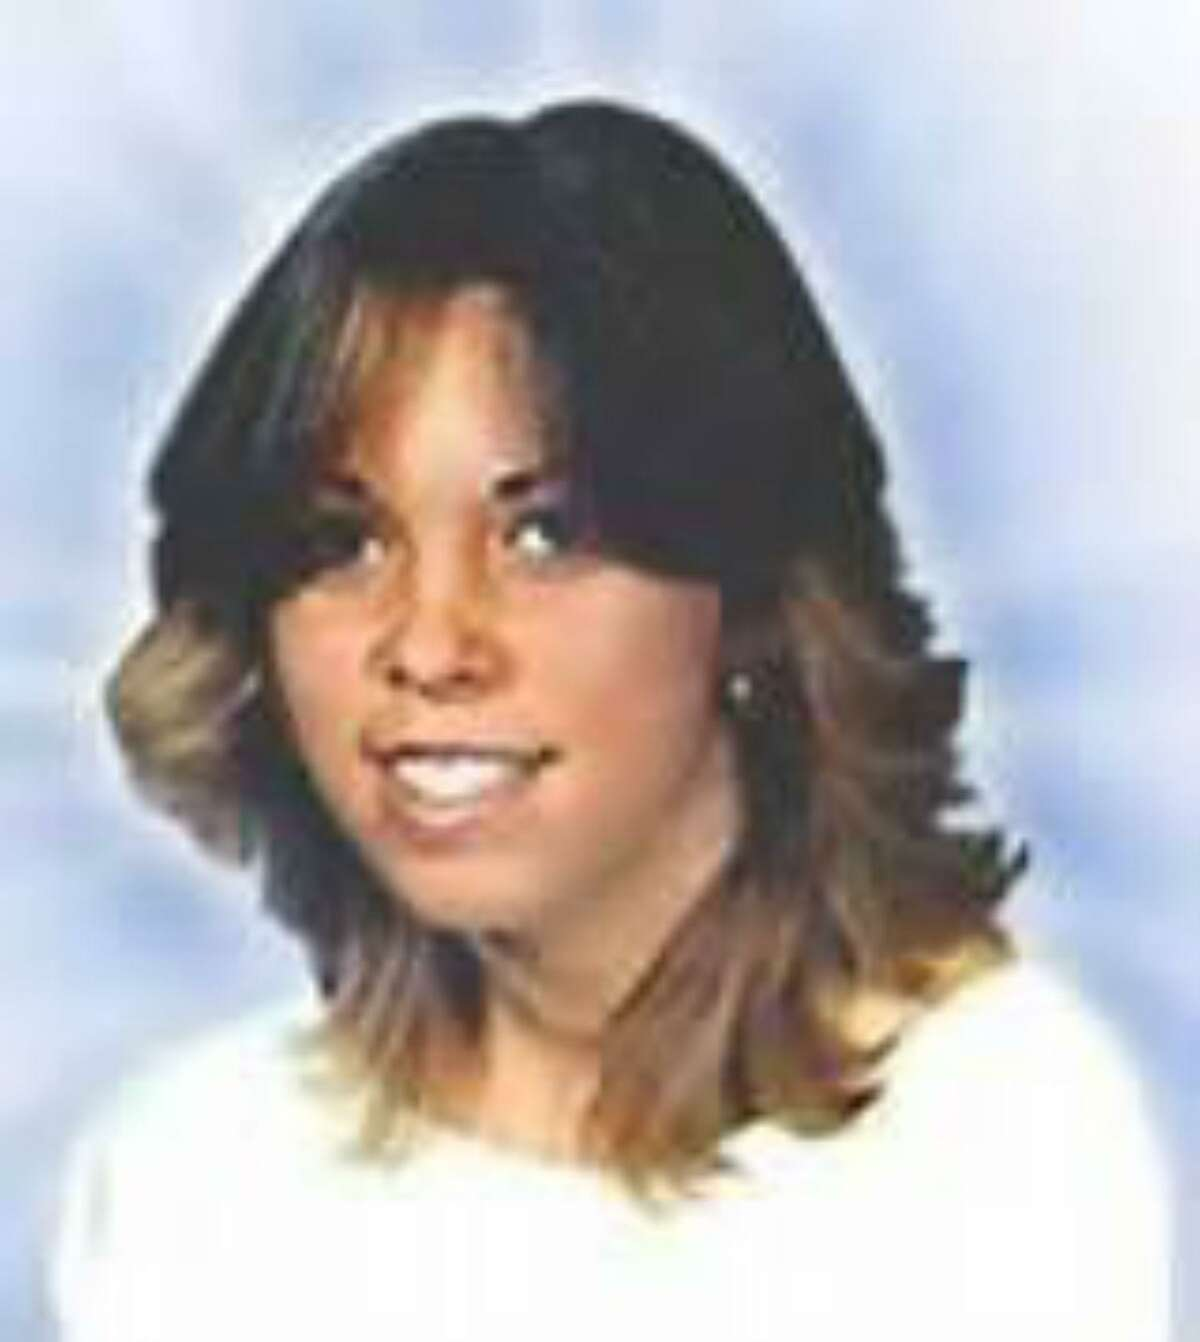 De Anna Lynn Johnson, 14, was found dead in 1982 in Vacaville.